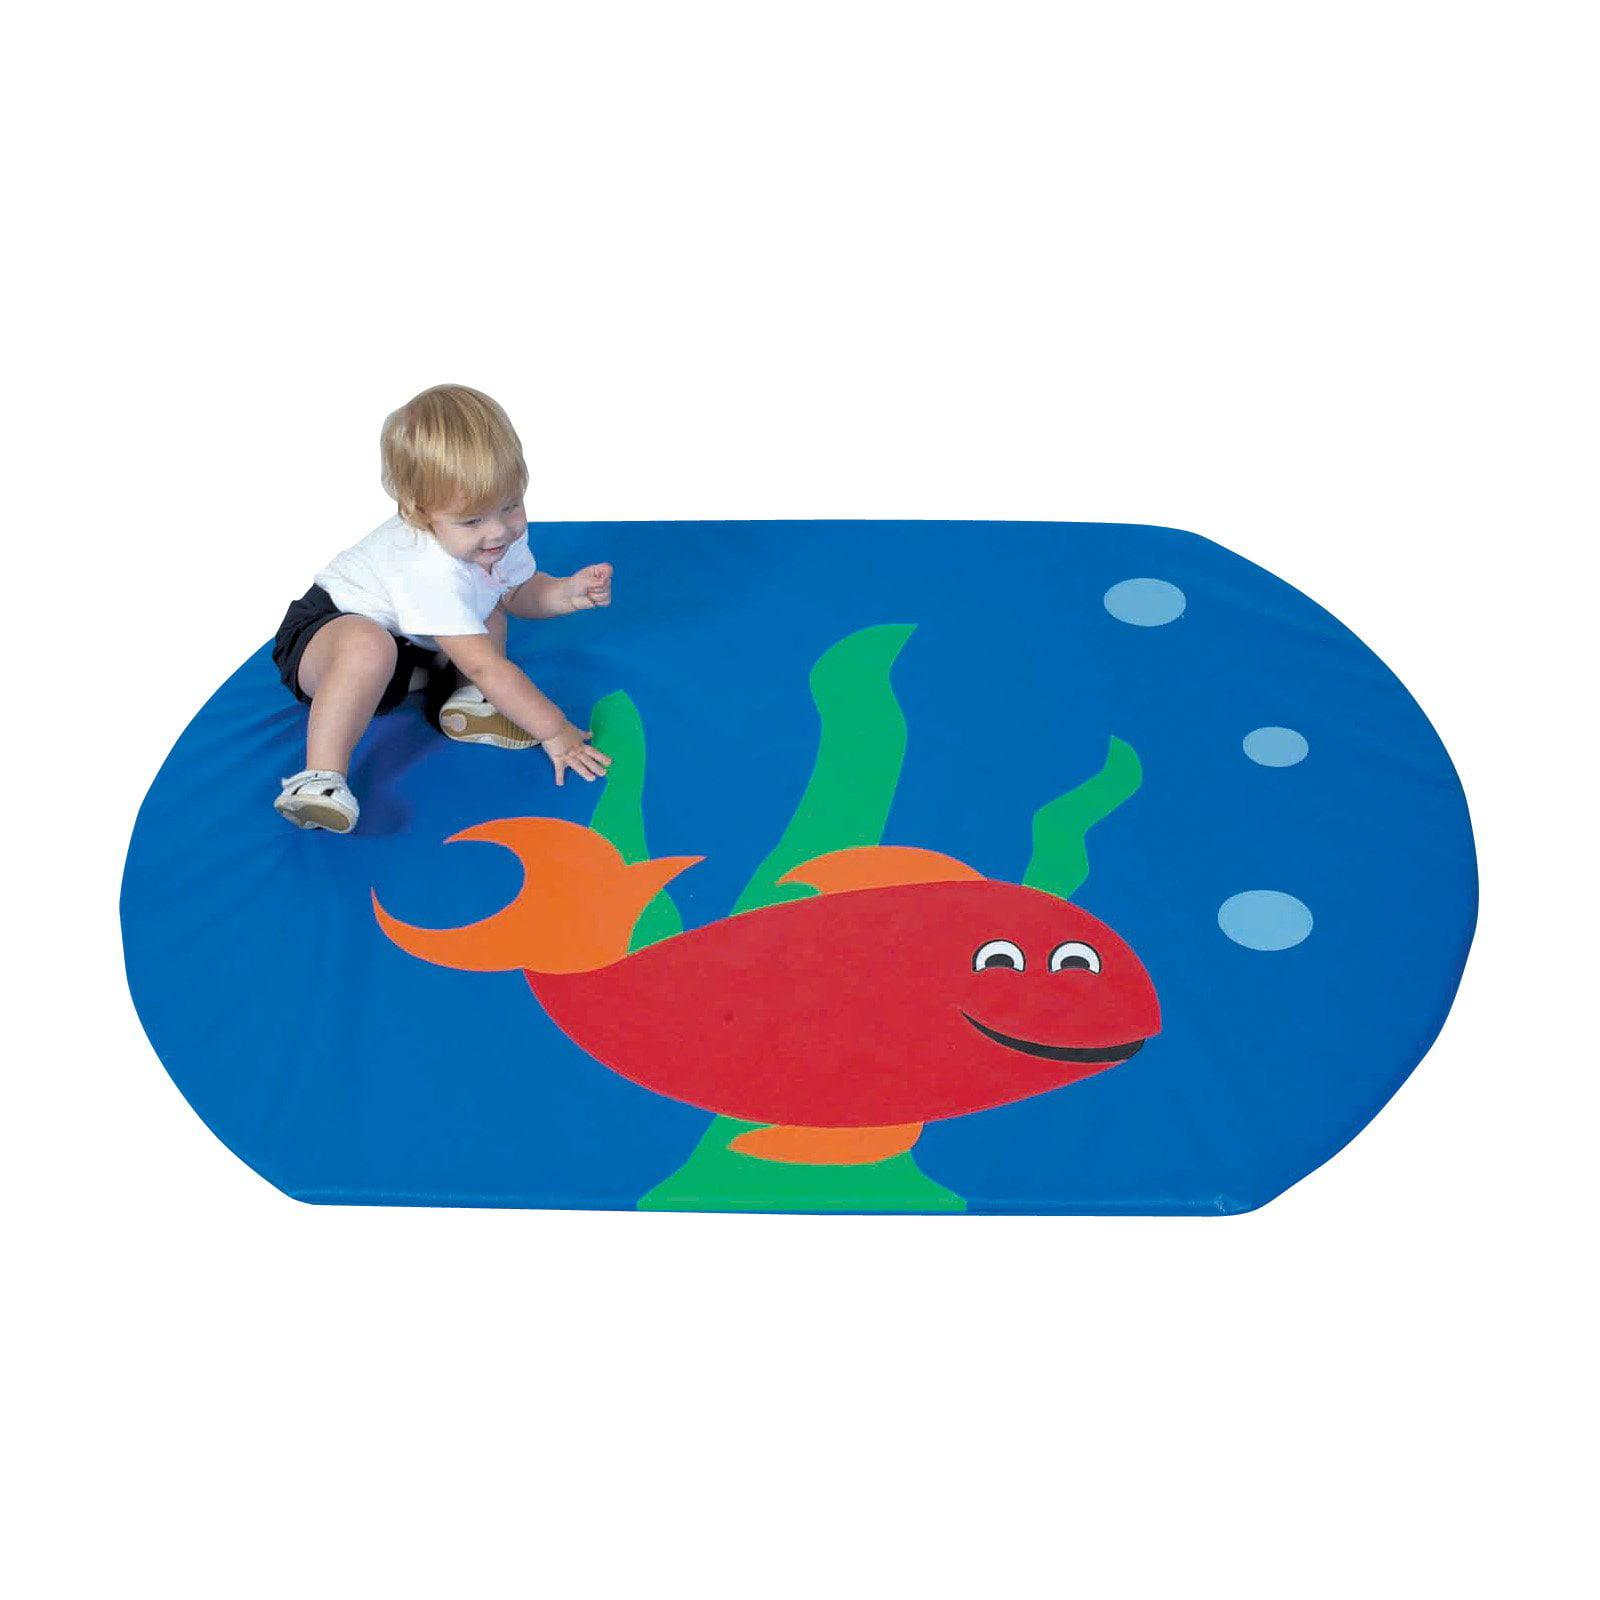 Children's Factory Fish Bowl Activity Mat by Children%27s Factory